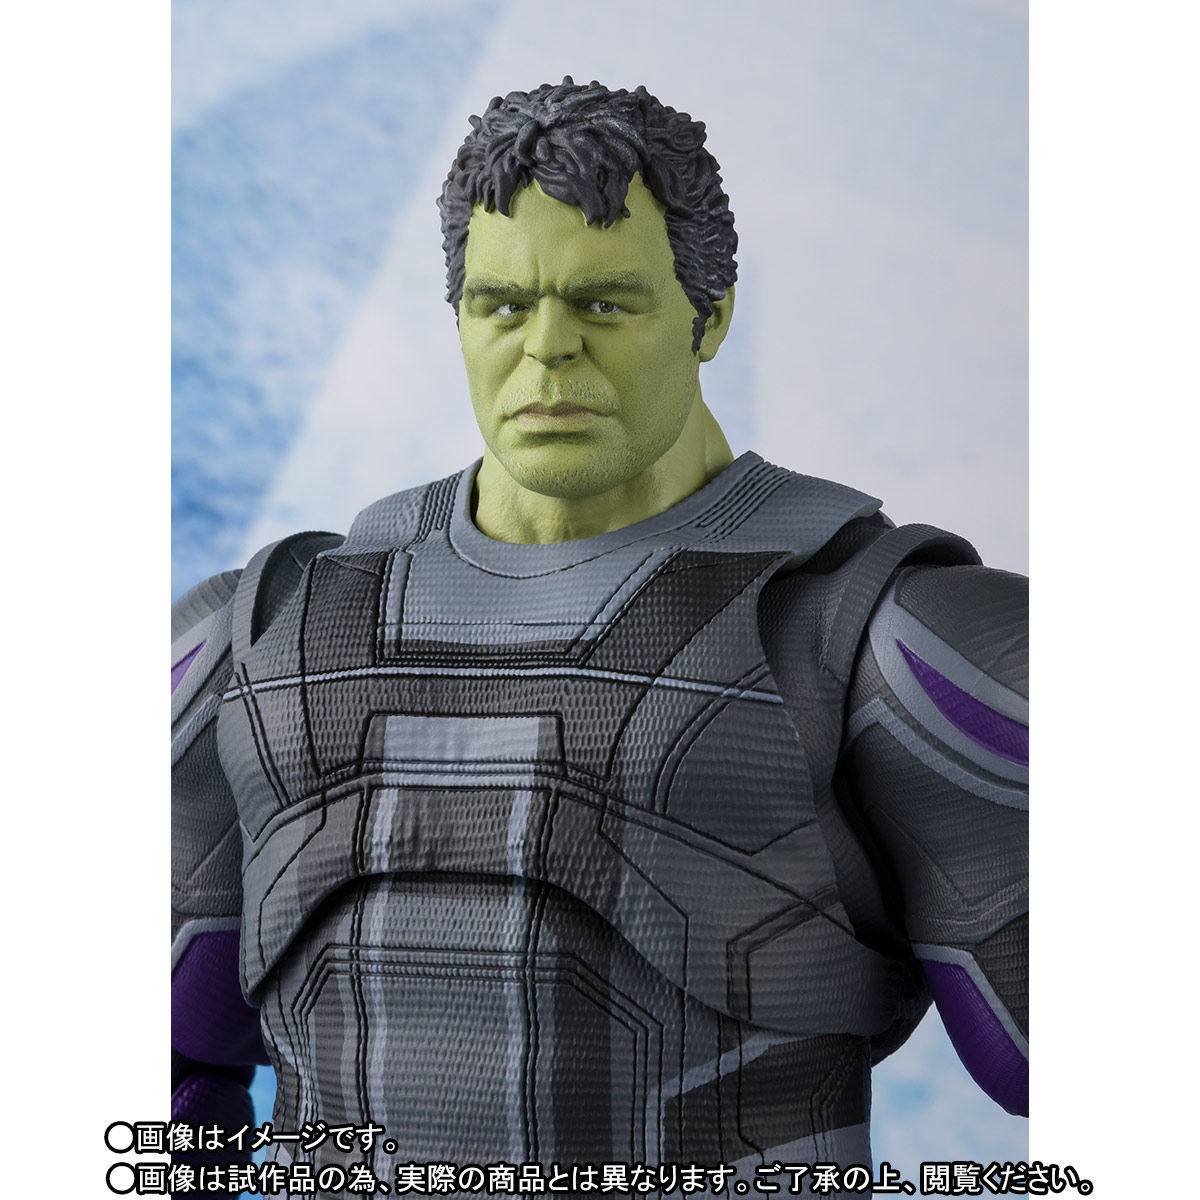 S.H.Figuarts『ハルク』アベンジャーズ/エンドゲーム アクションフィギュア-008